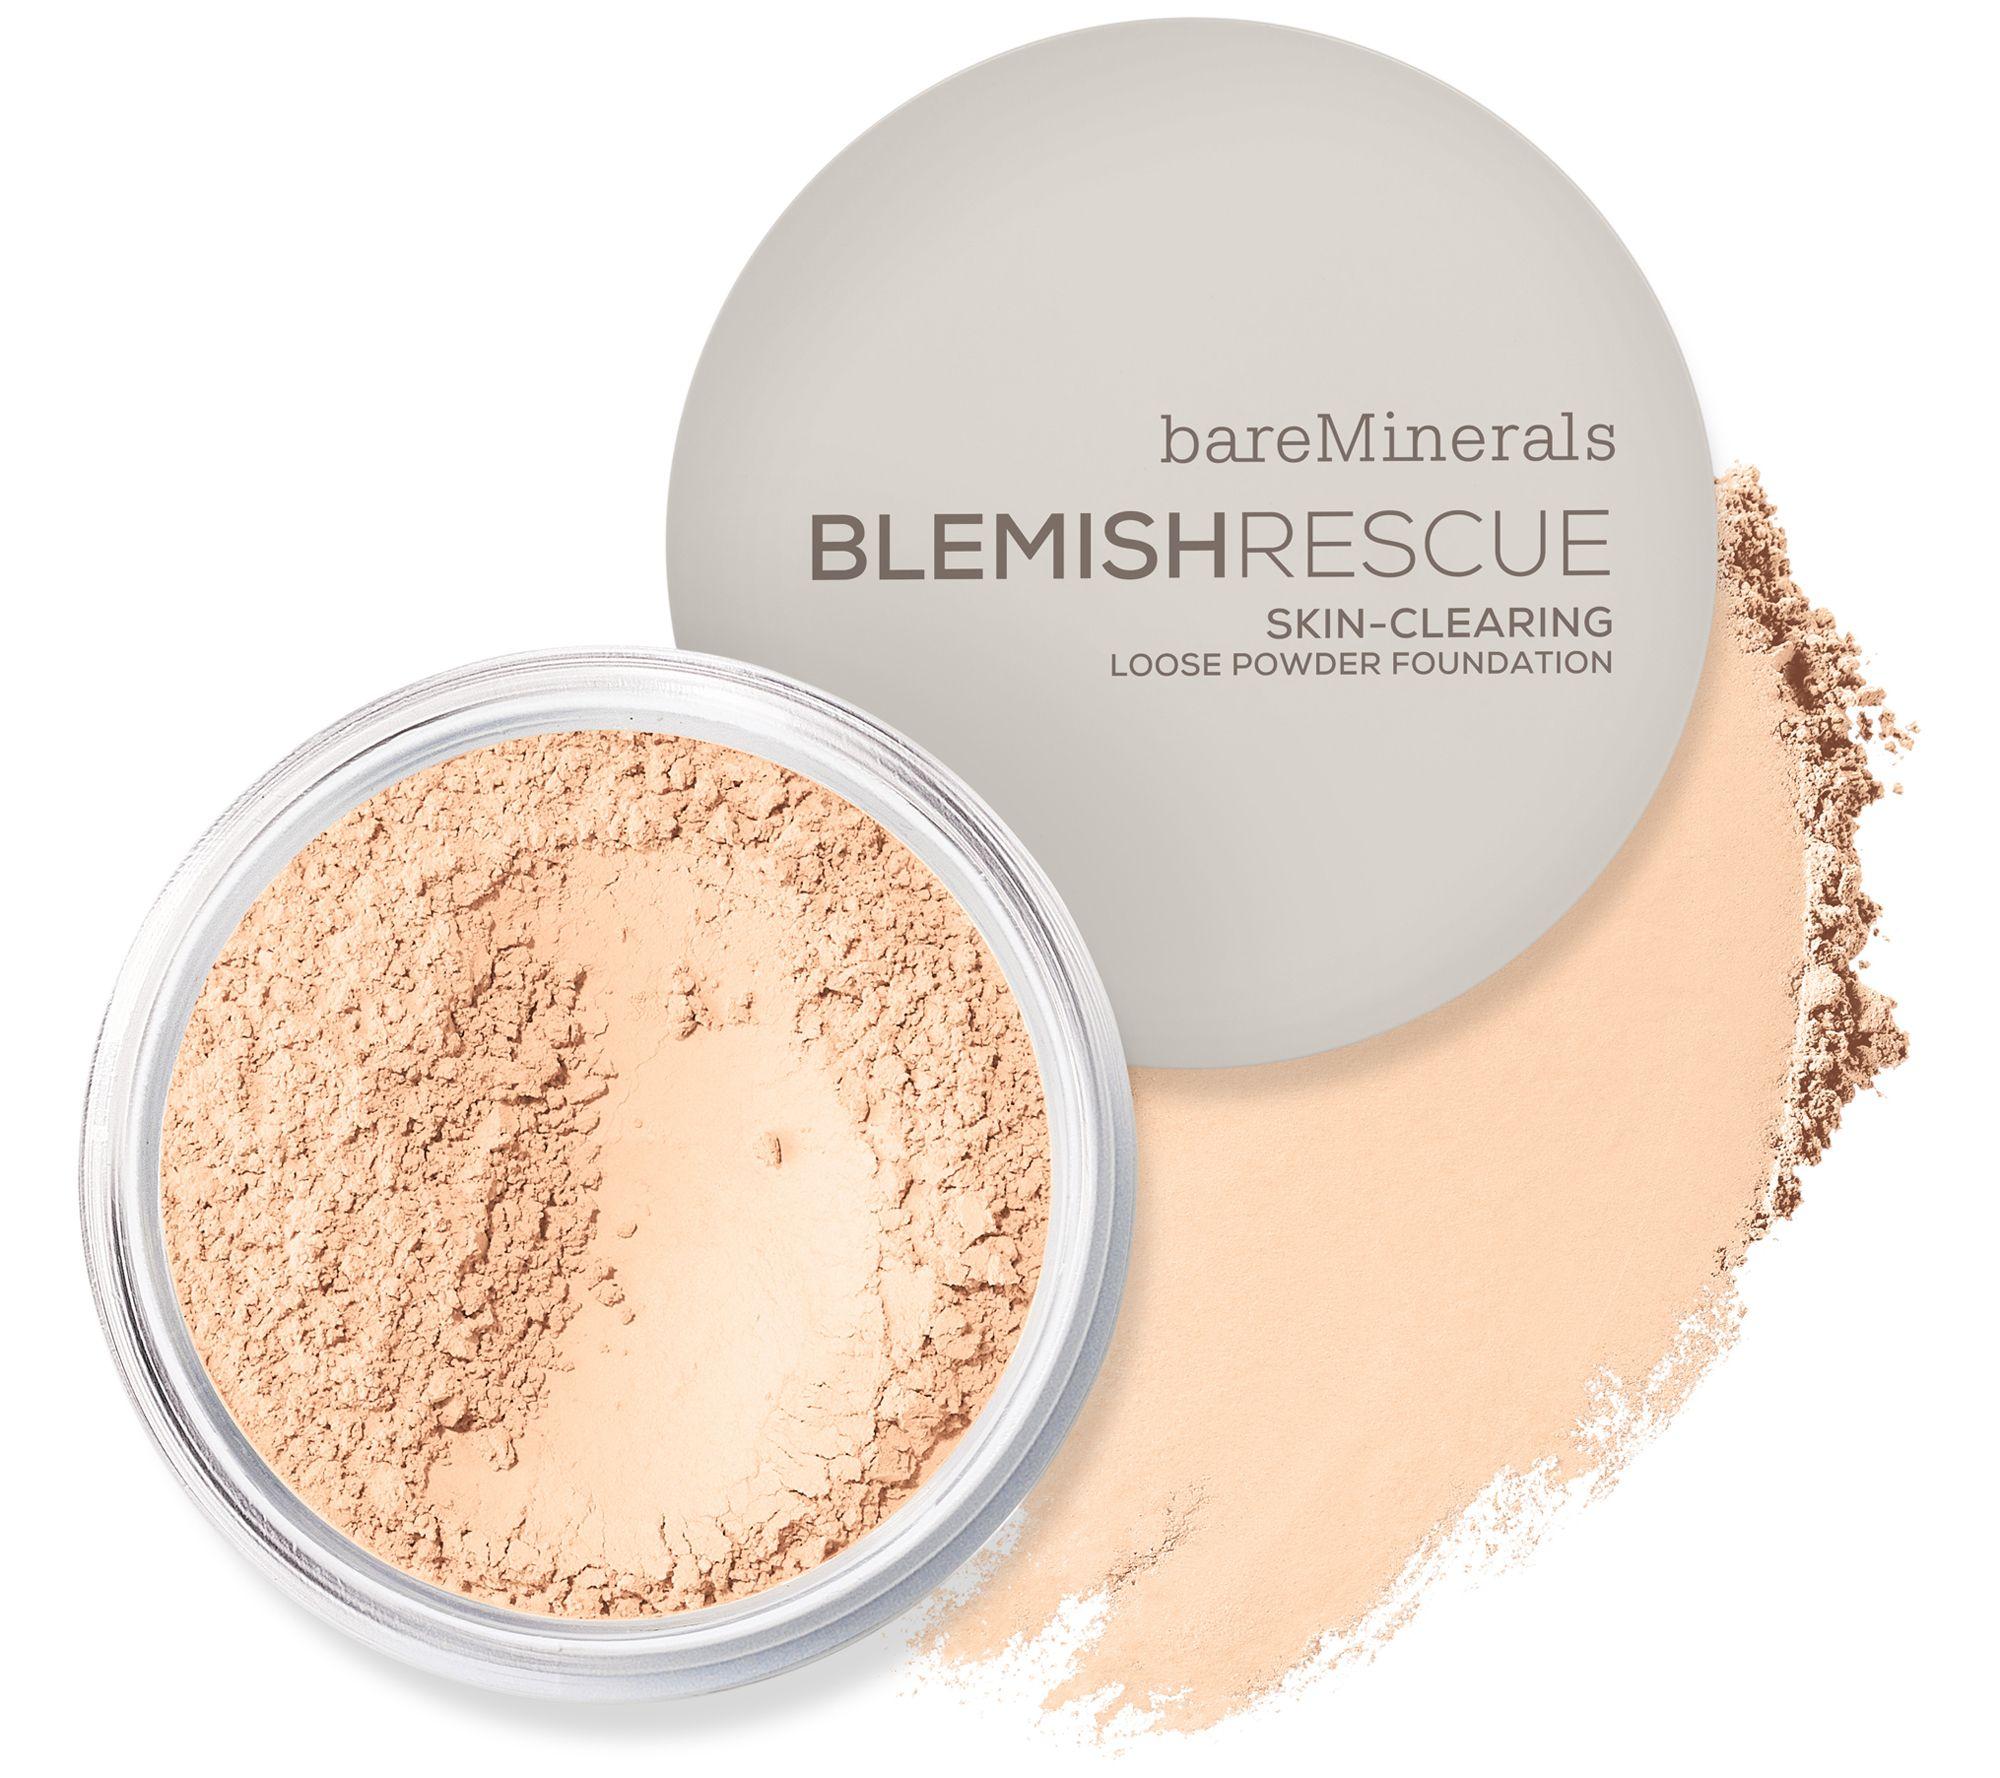 Bareminerals Blemish Rescue Loose Powder Foundation Qvc Com